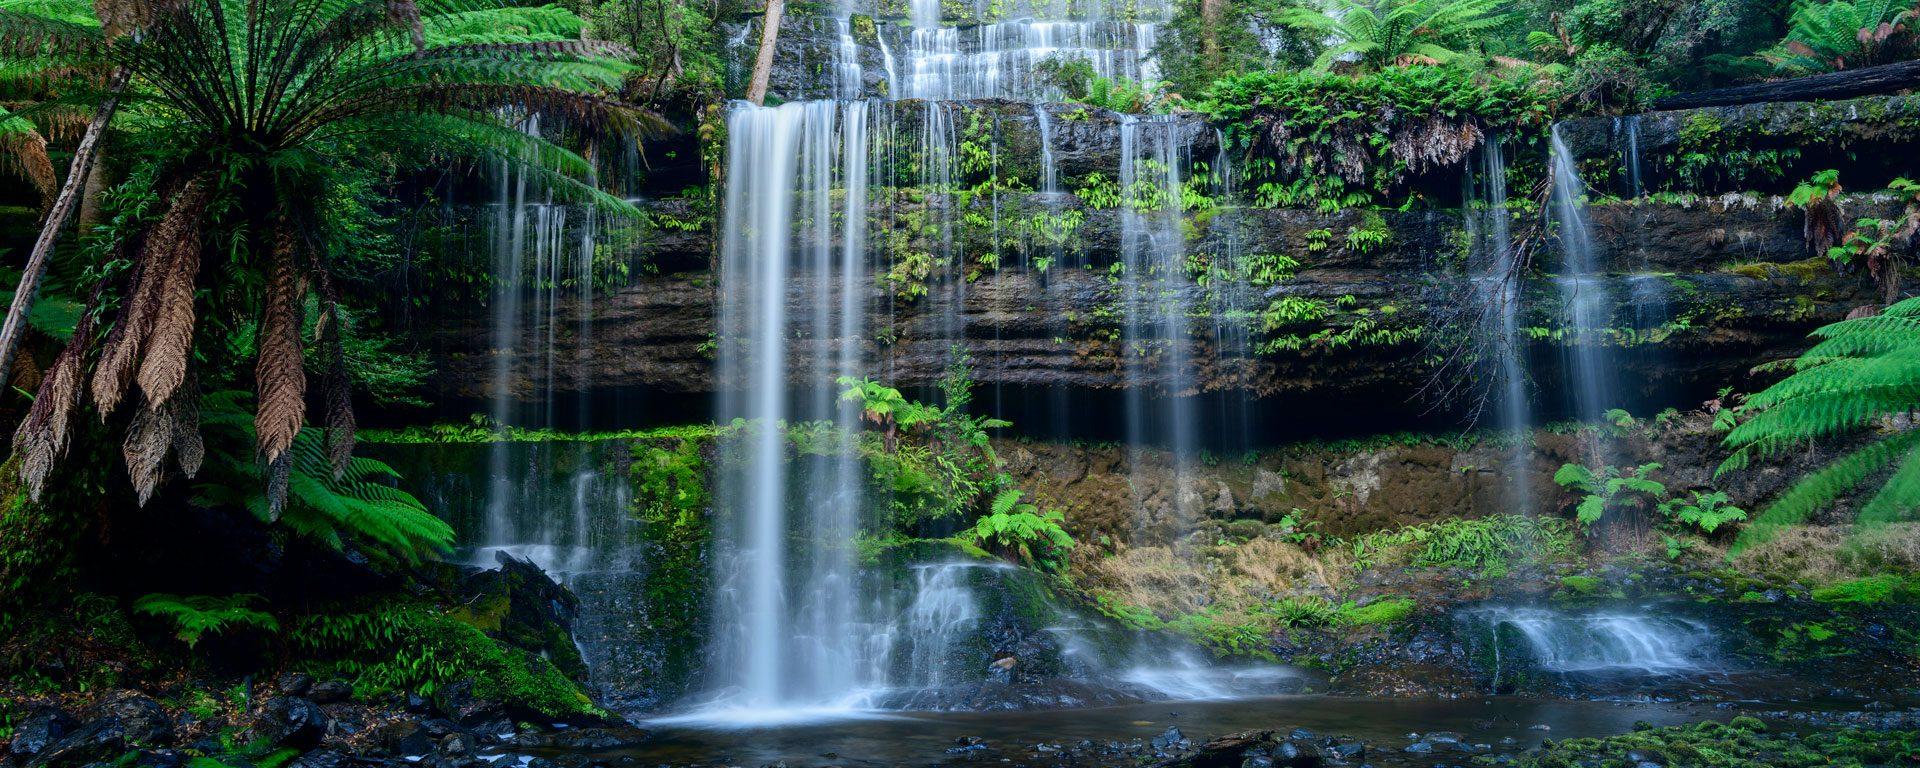 Russell Falls in Mount Field National Park, Australia